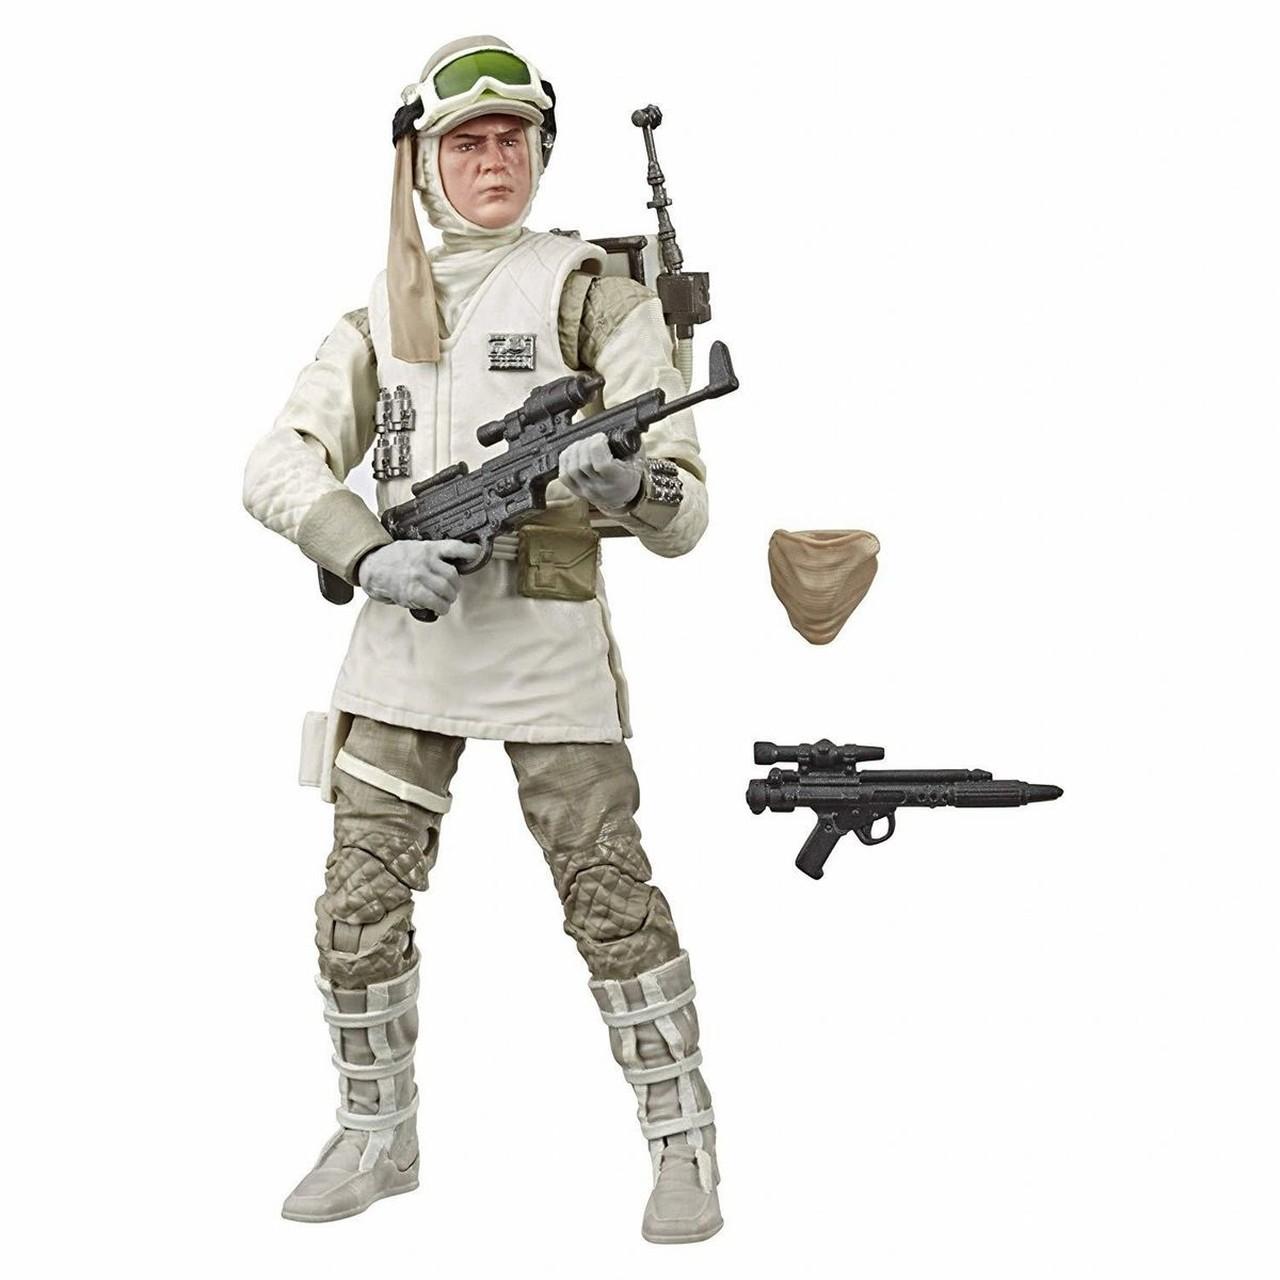 Action Figure Rebel Soldier: Star Wars (The Black Series) (40 Anos O Império Contra-Ataca)  (40th The Empire Strikes Back) E8078  - Hasbro